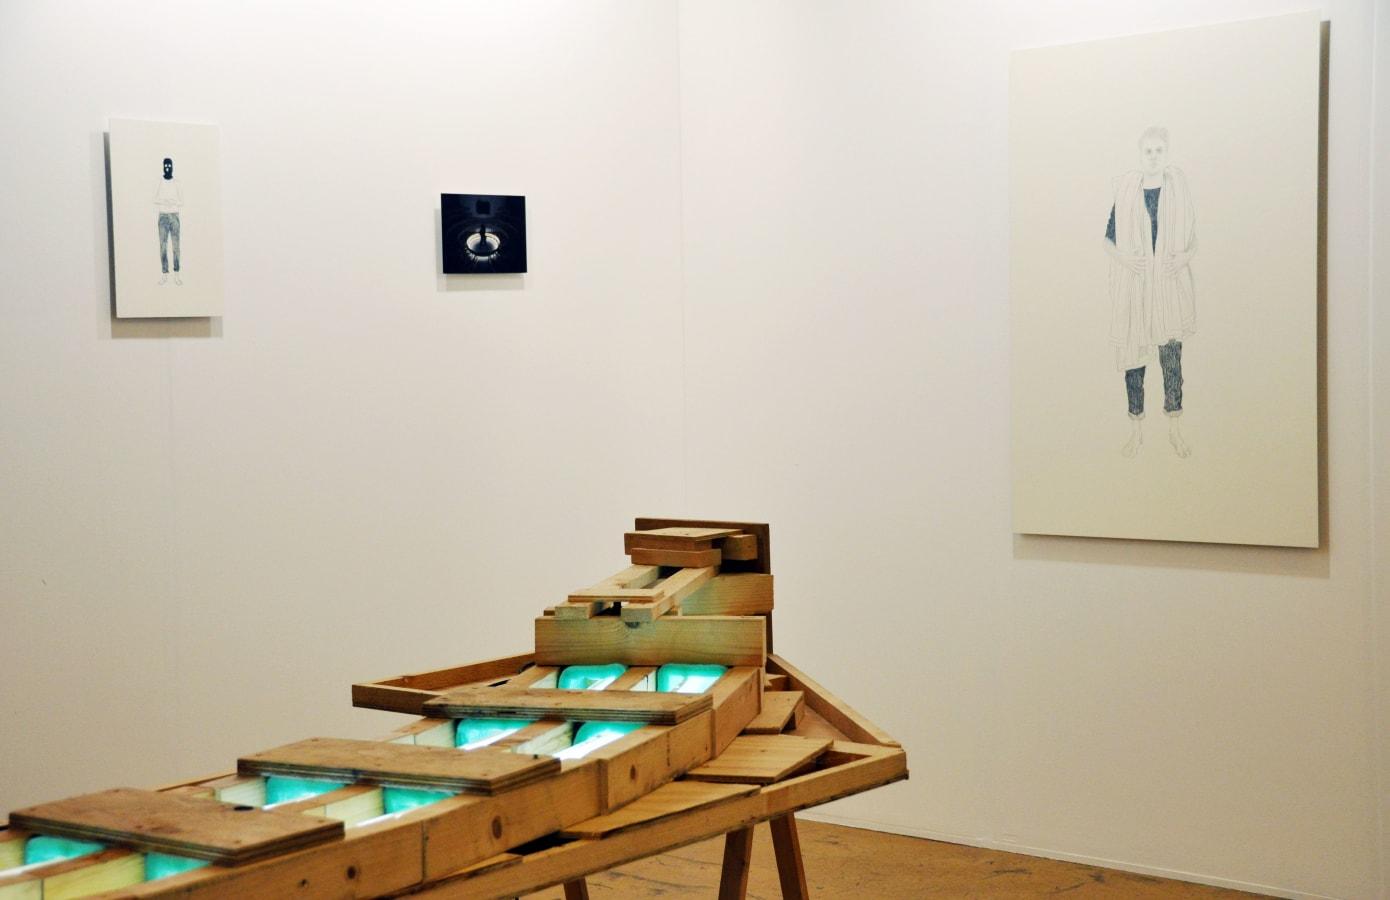 Art Rotterdam 2016, Thijs Ebbe Fokkens,